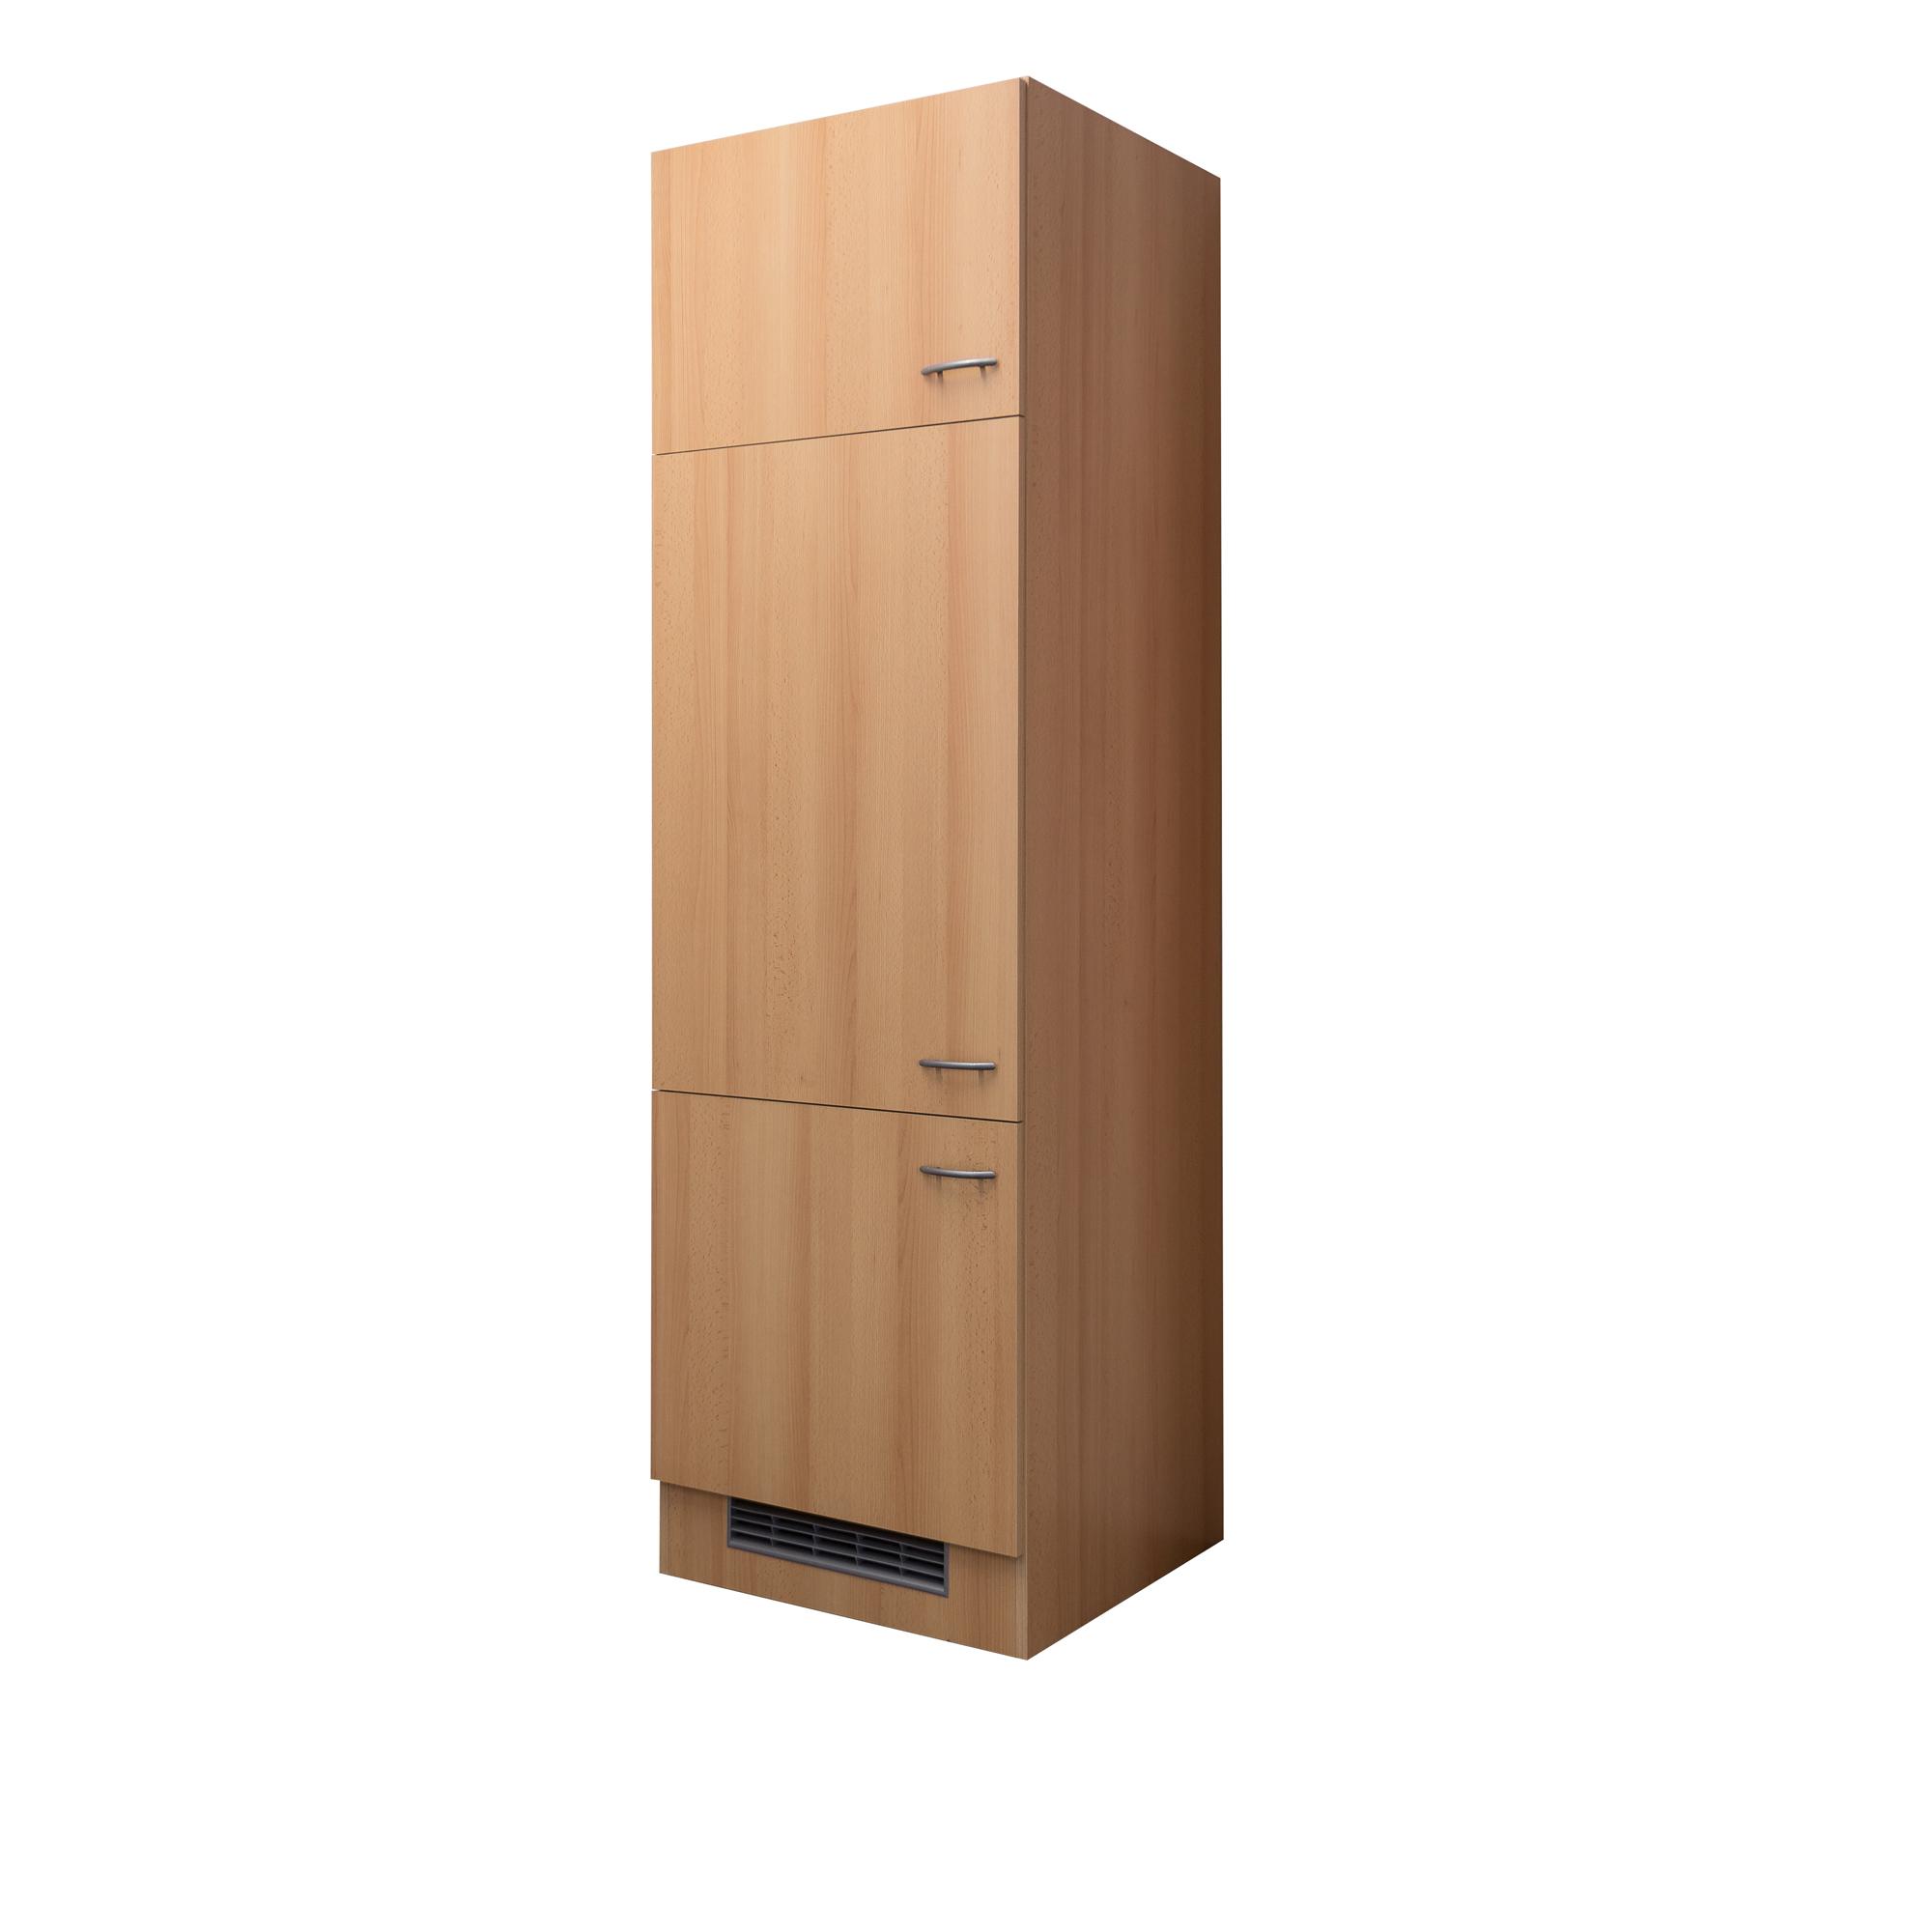 Kühlschrankumbauschrank NANO - inkl. Einbau-Kühlschrank ...